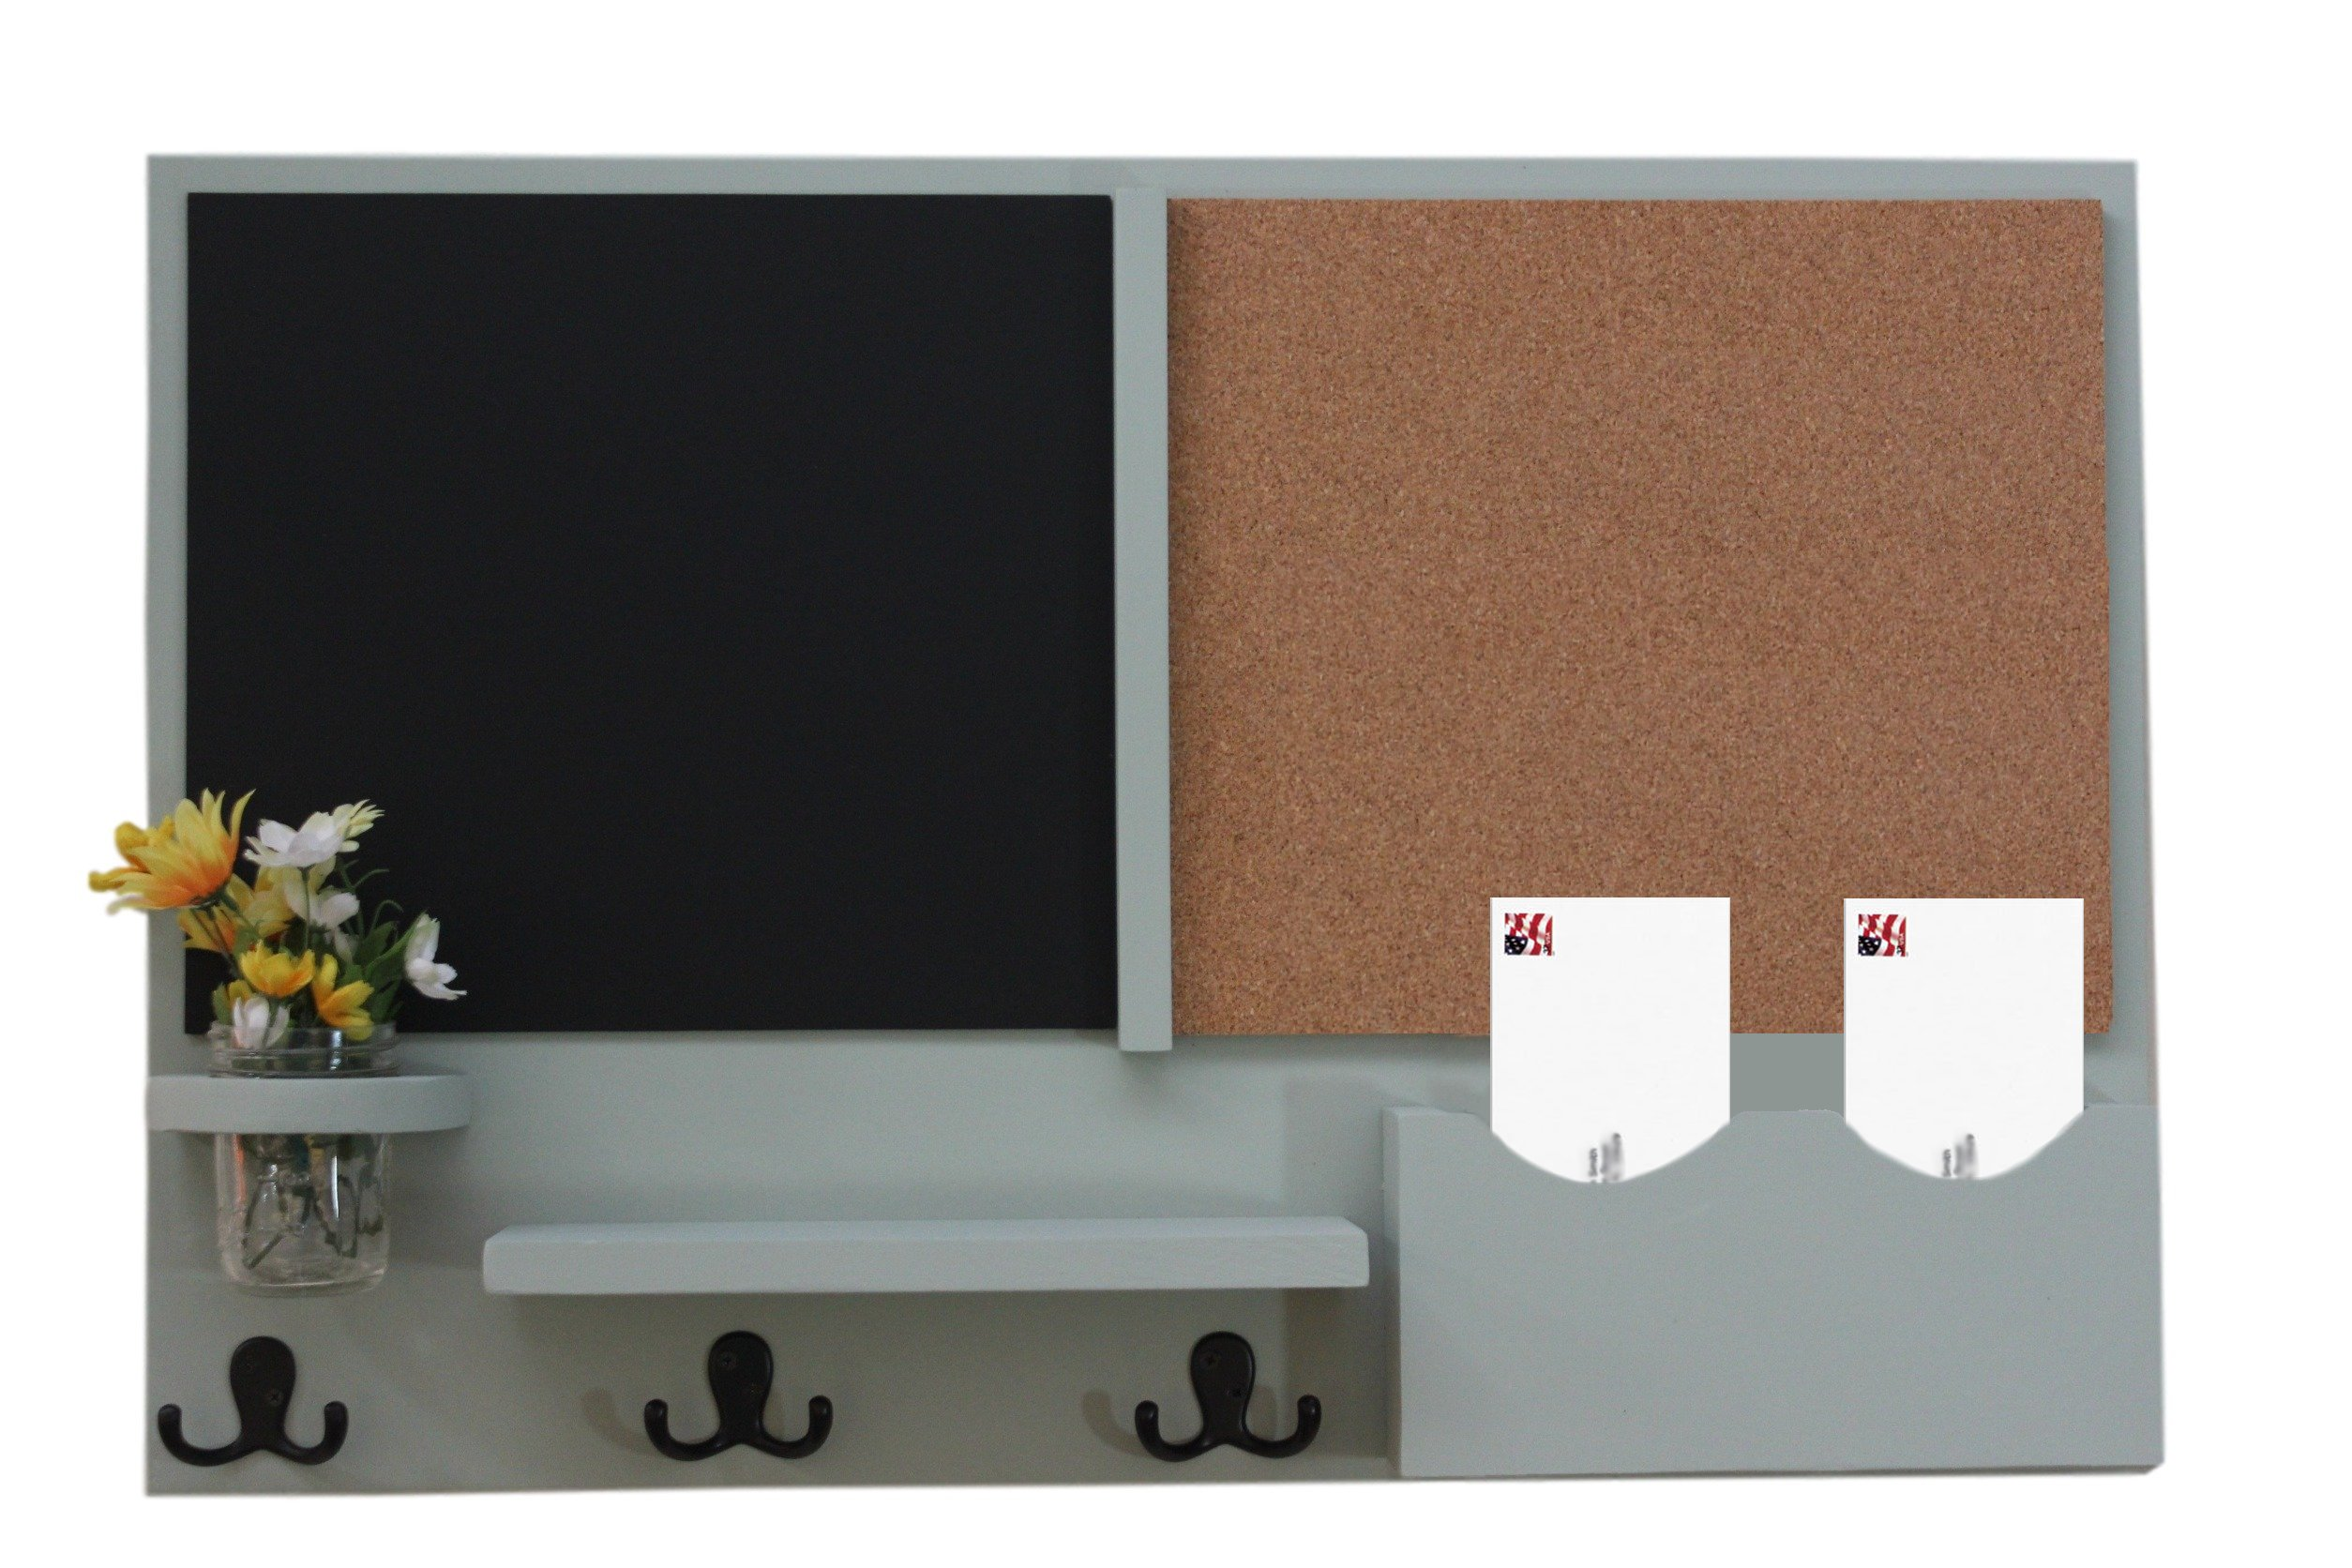 Legacy Studio Décor Message Center with Chalkboard & Cork Letter Holder Coat Rack Key Hooks (Smooth, Green Tea)